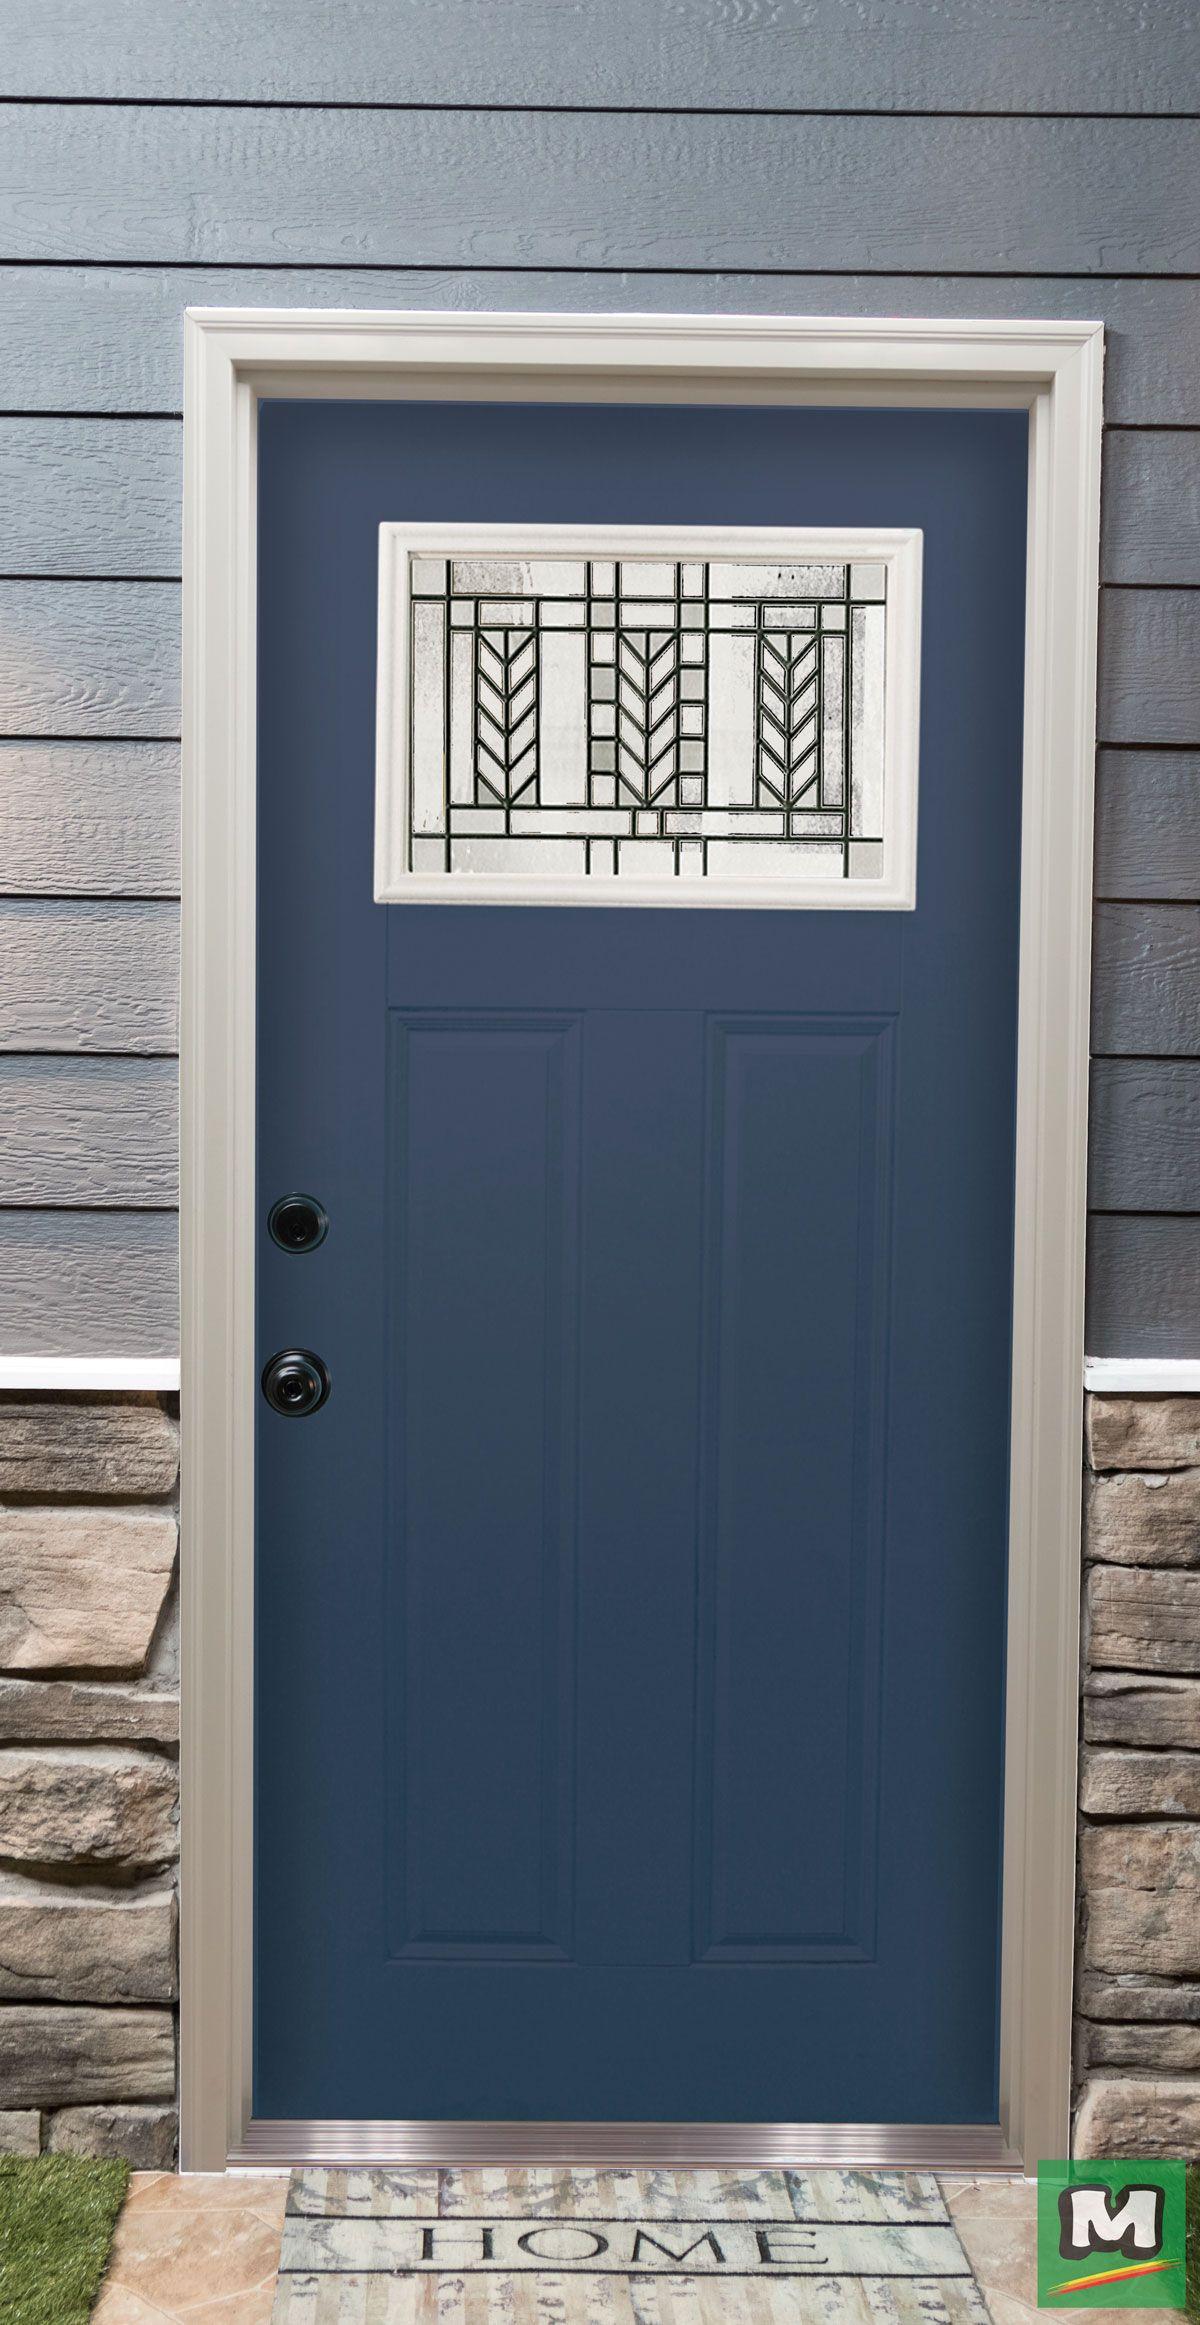 This Attractive Mastercraft Door Features The Morrison Series